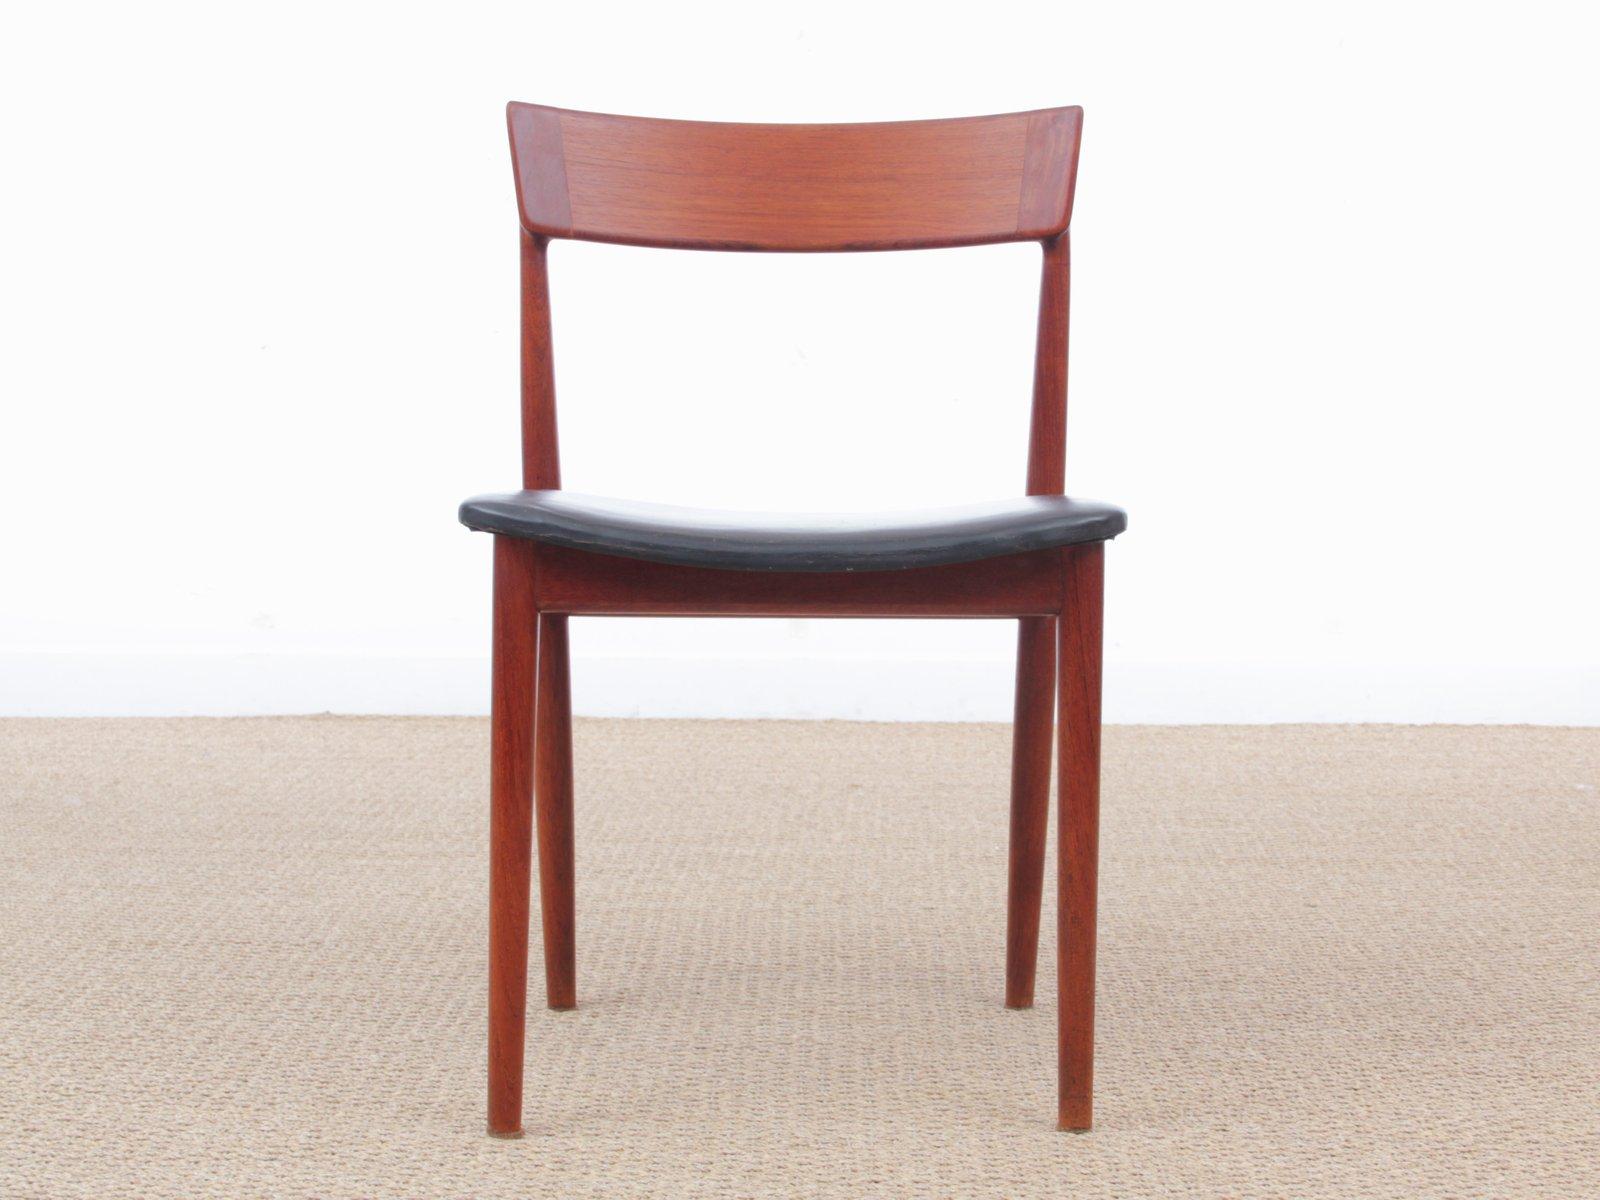 chaises vintage scandinaves en teck par henry rosengren hansen pour brande mbelindustri set de 5 - Chaise Vintage Scandinave